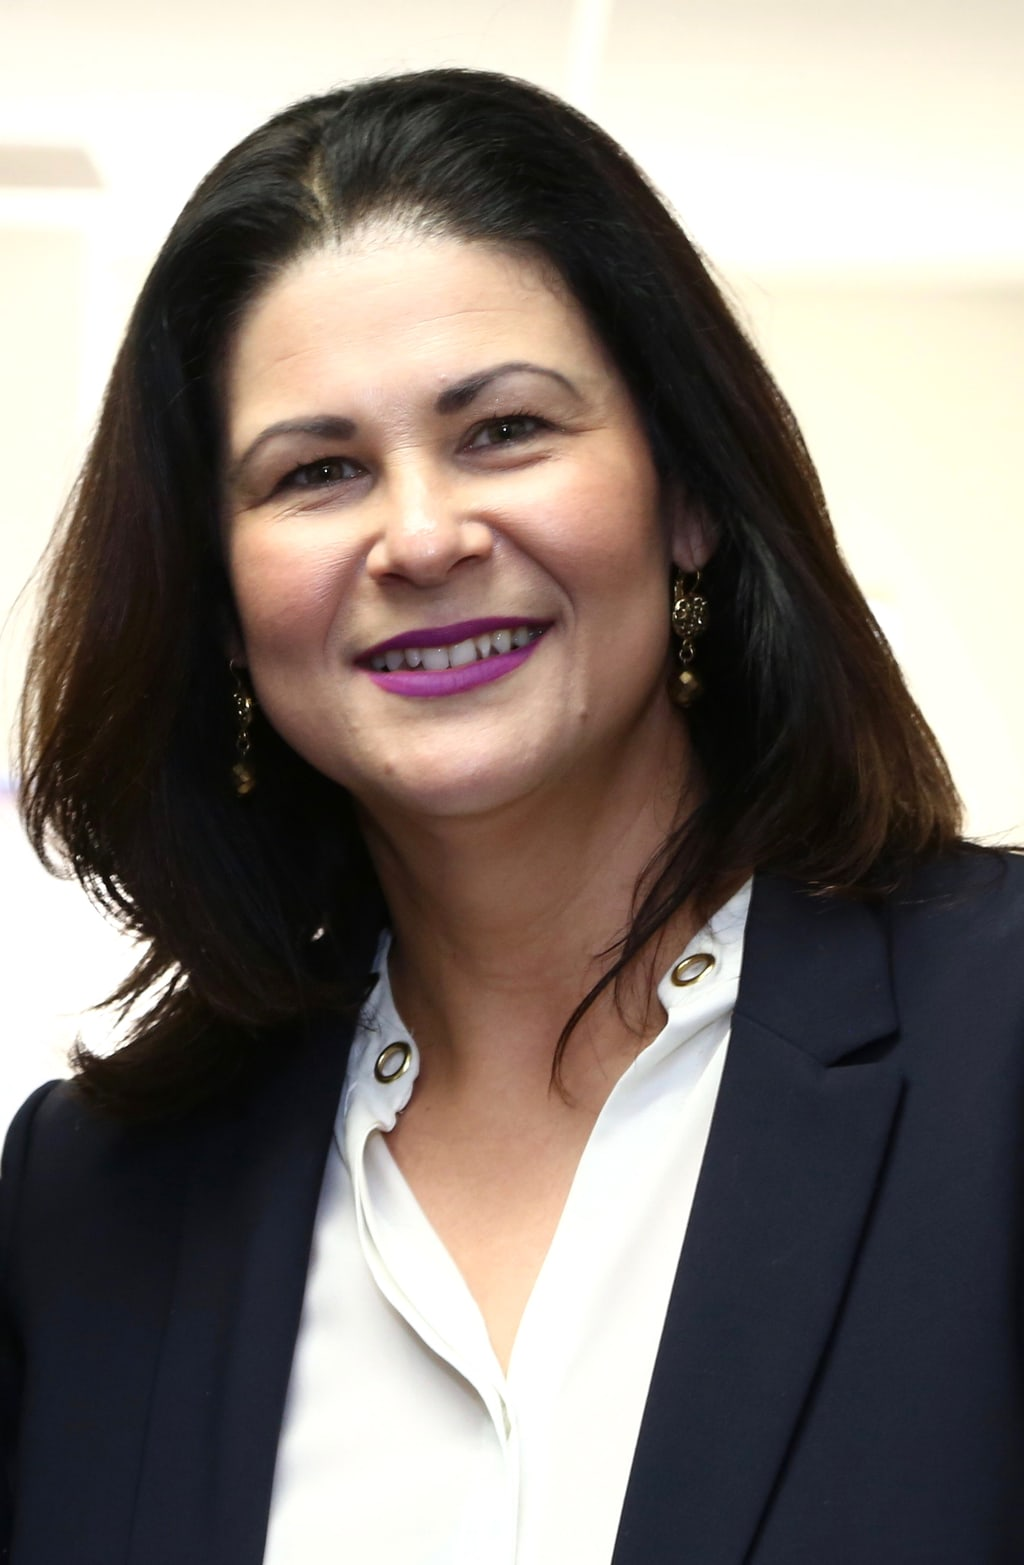 Briceño: I March for Working Women